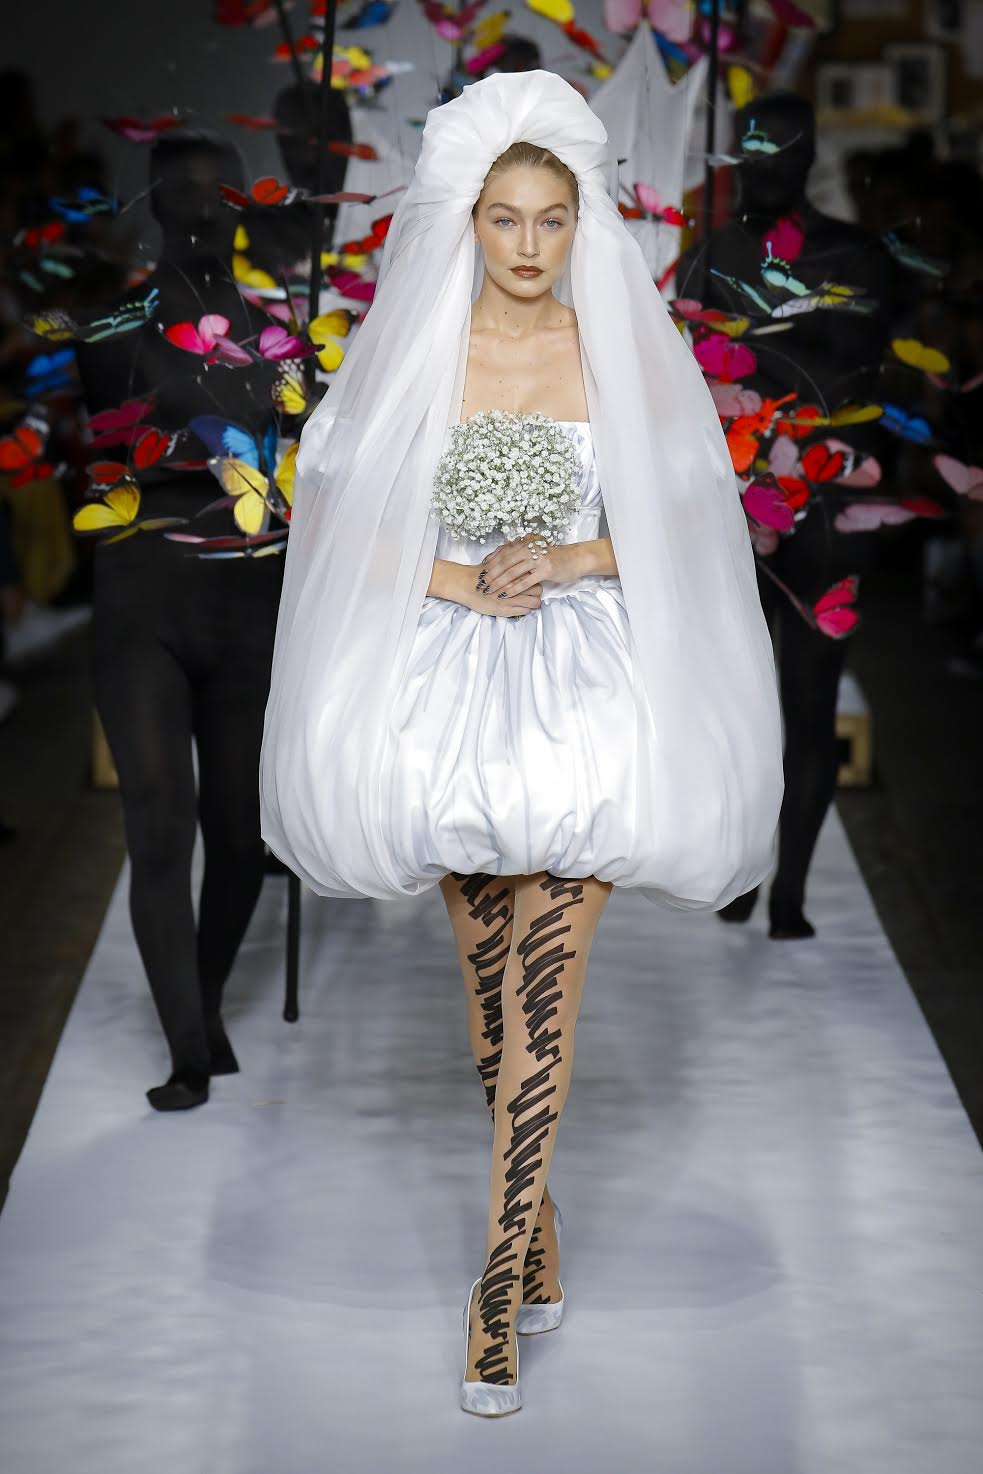 PHOTO:  Fashionista